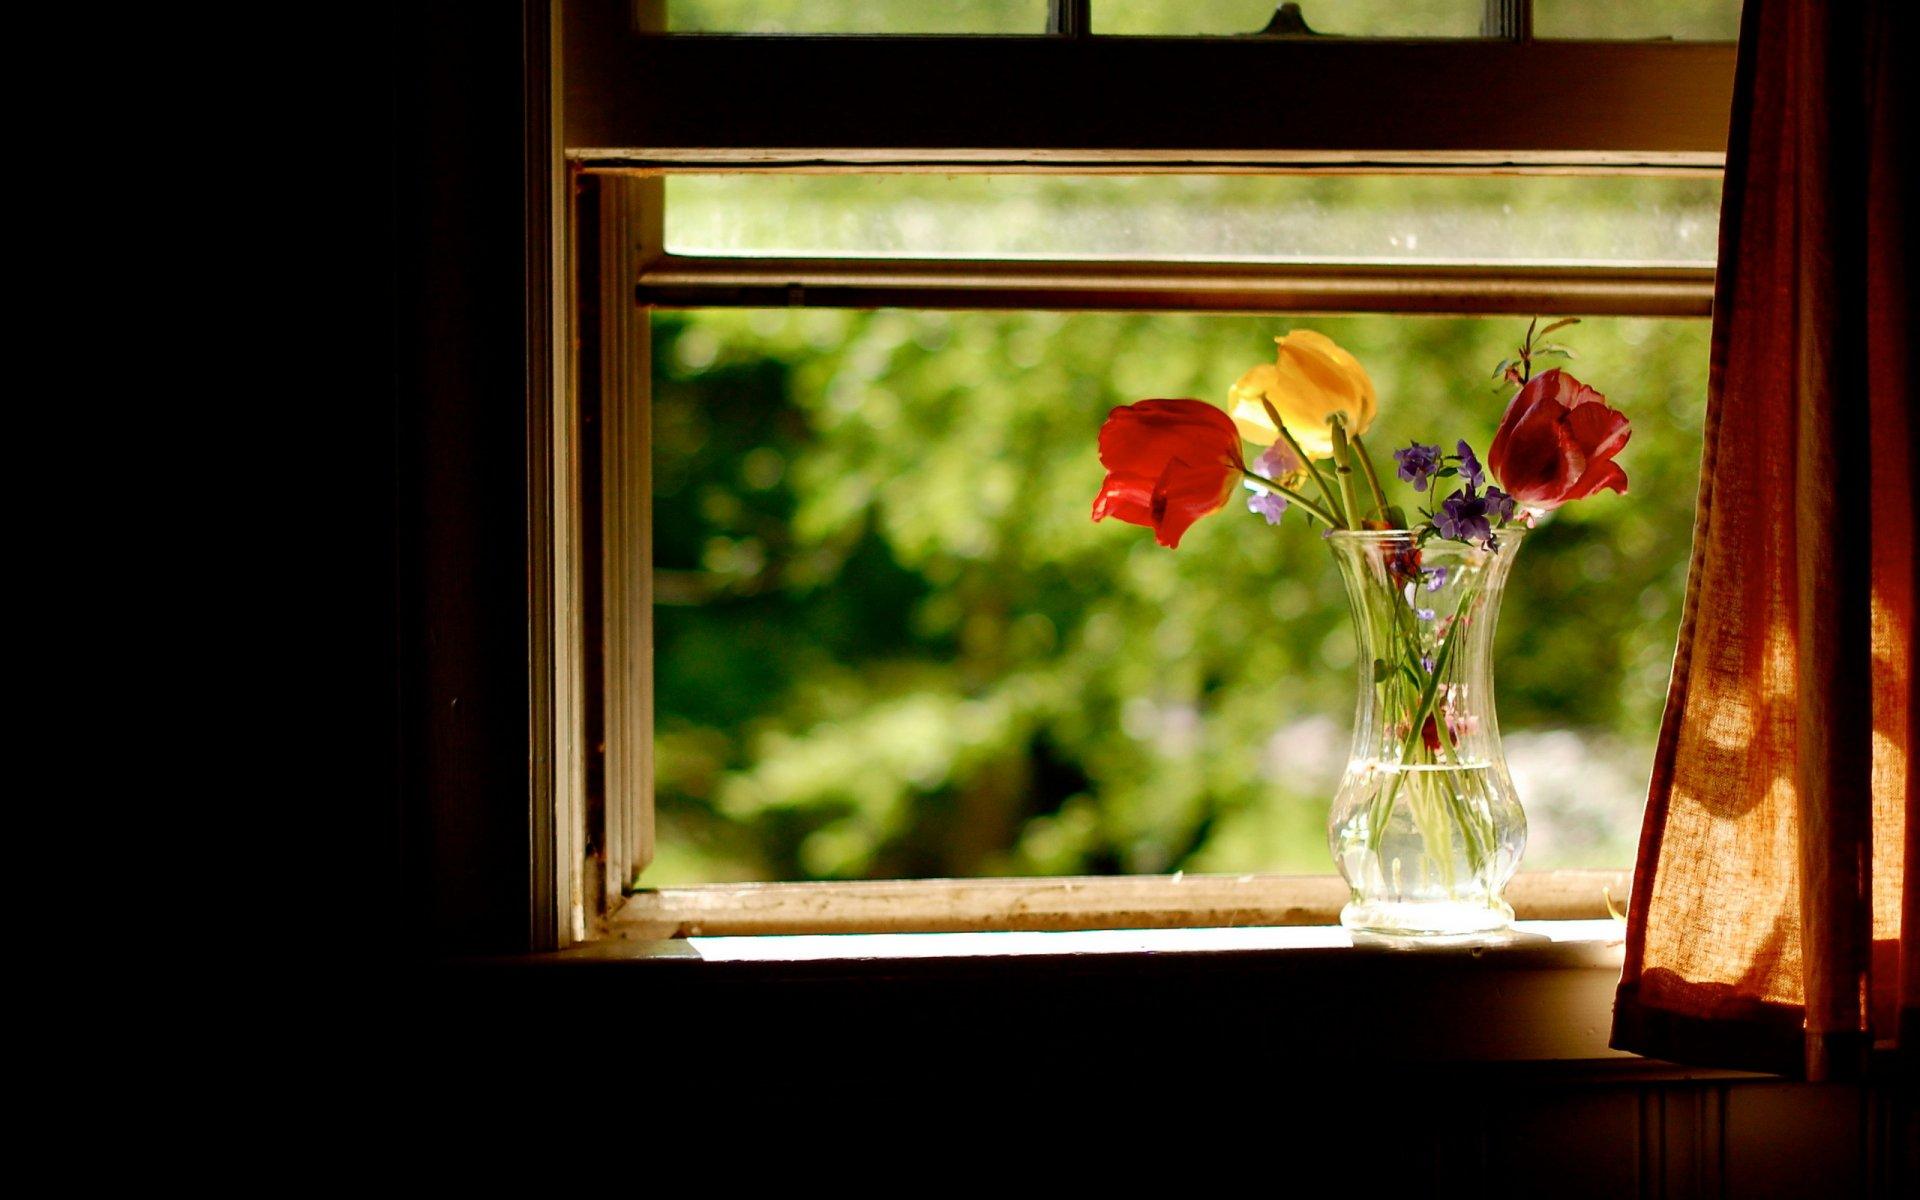 японское обои на телефон окно в розах миди